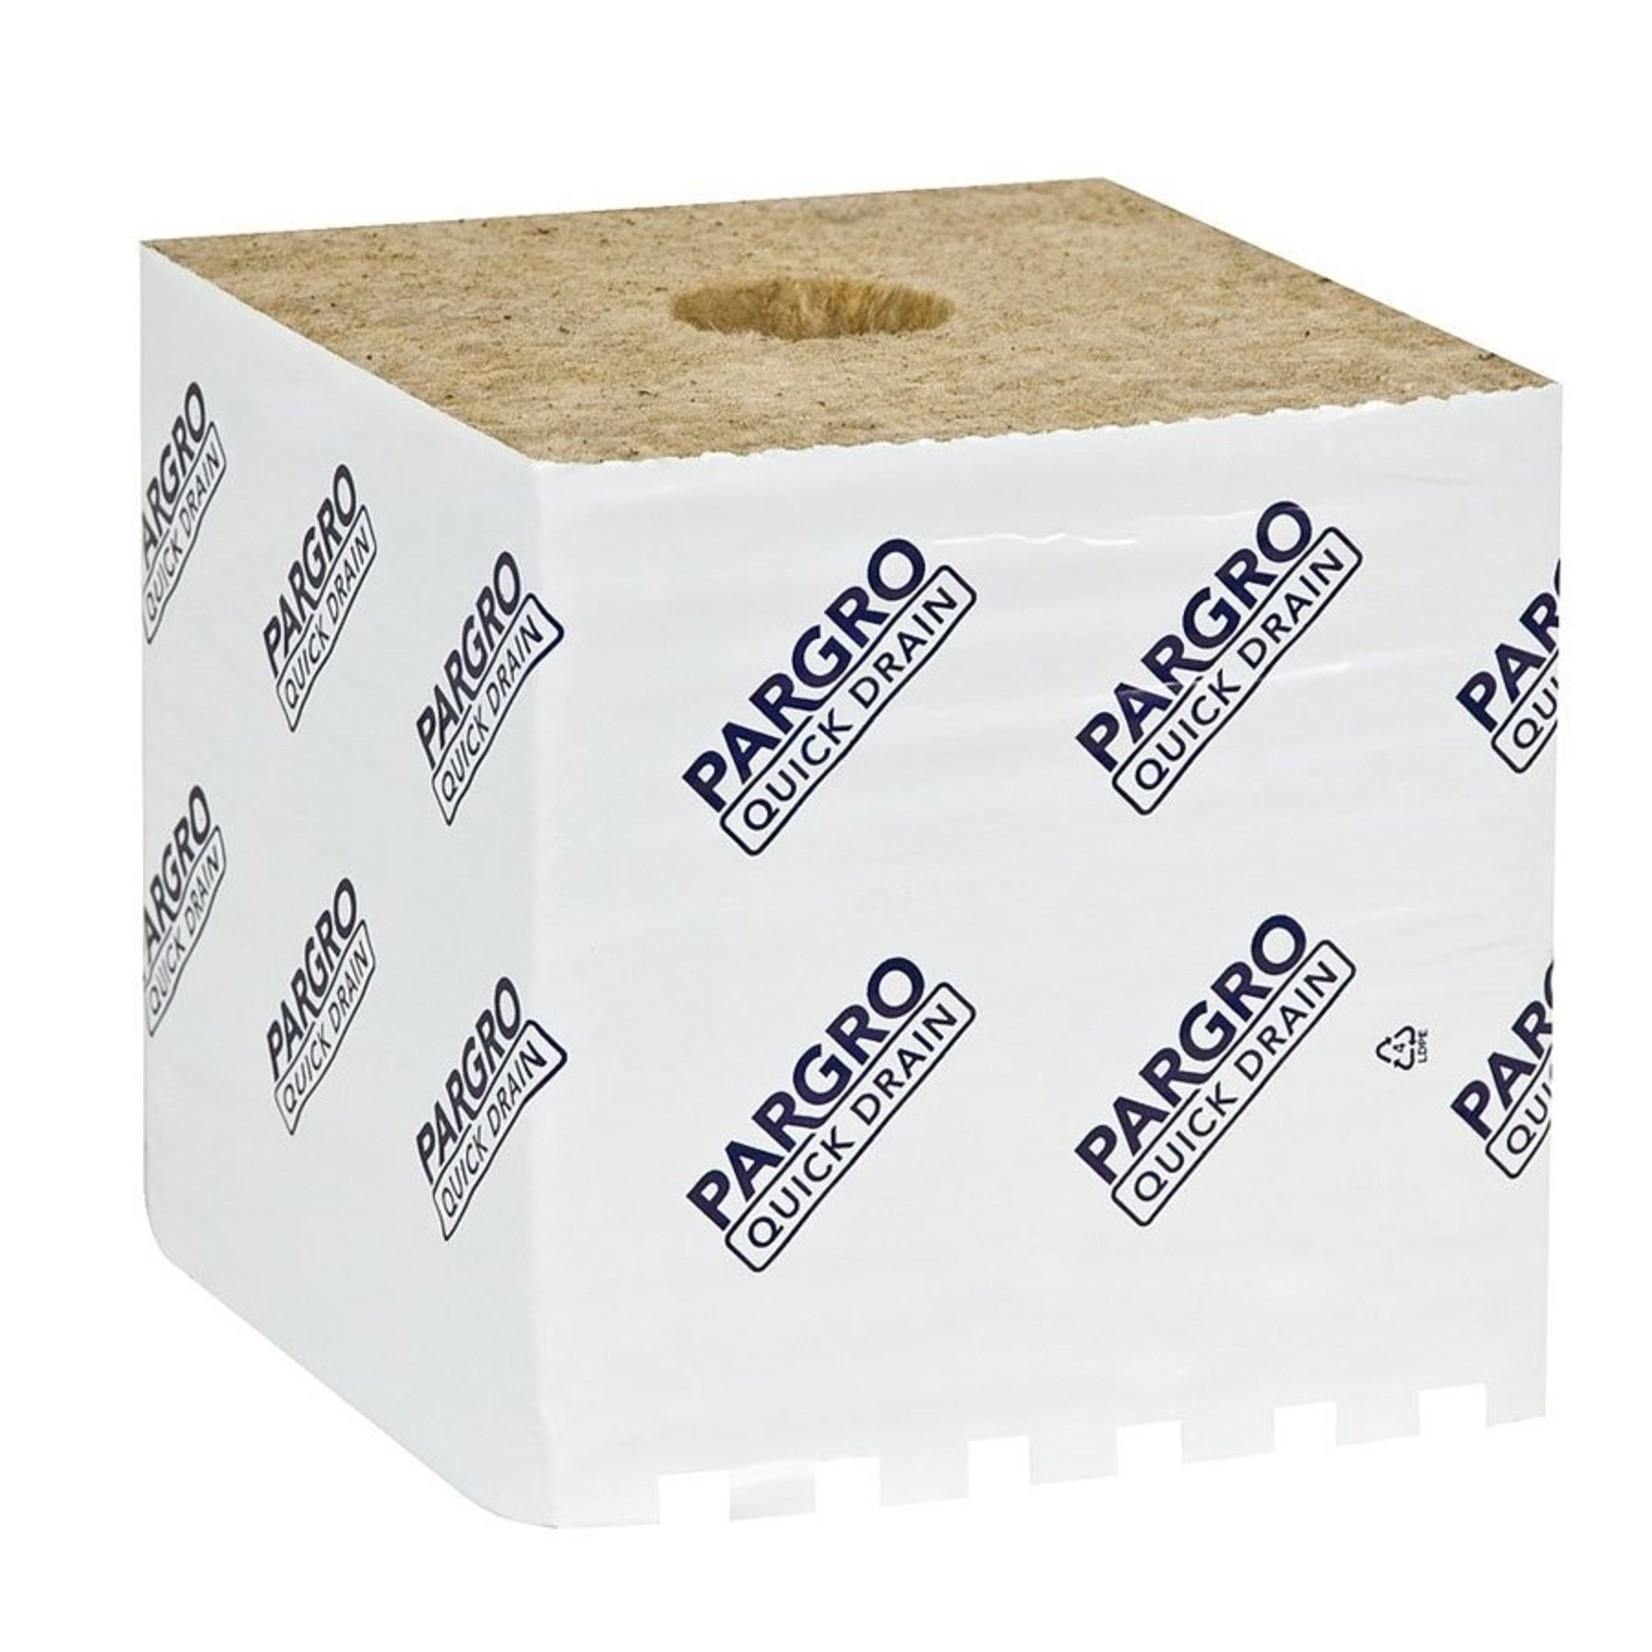 Pargro PARGRO QD BLOCKS 4''X4''X4 CASE (144)